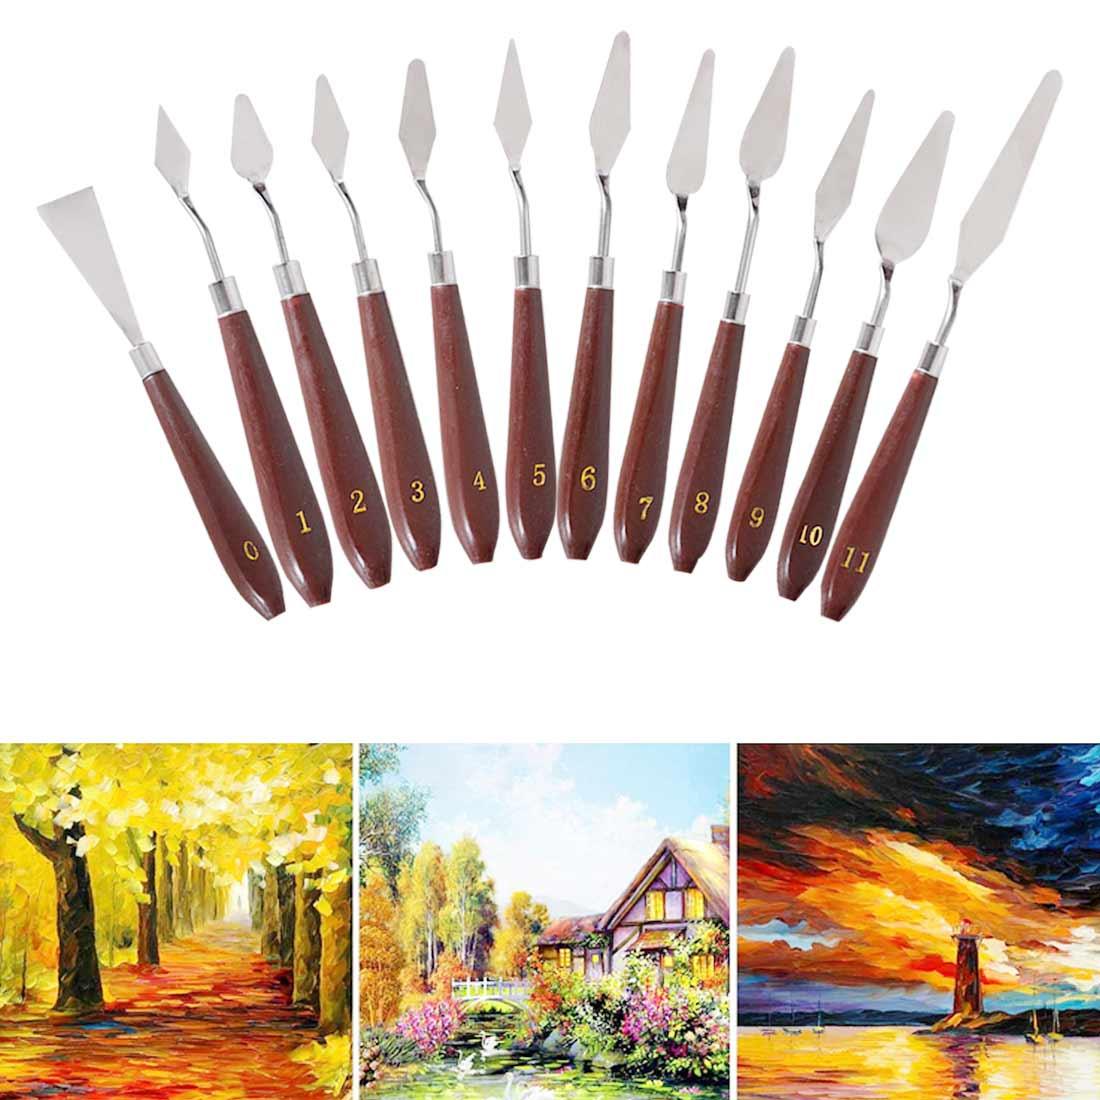 Paleta para dibujar espátula, cajón, cuchillo de acuarelas, pigmento de estudiante, mezcla de aceite, rascador, textura, herramienta de pintura de pintor, Arte Artístico